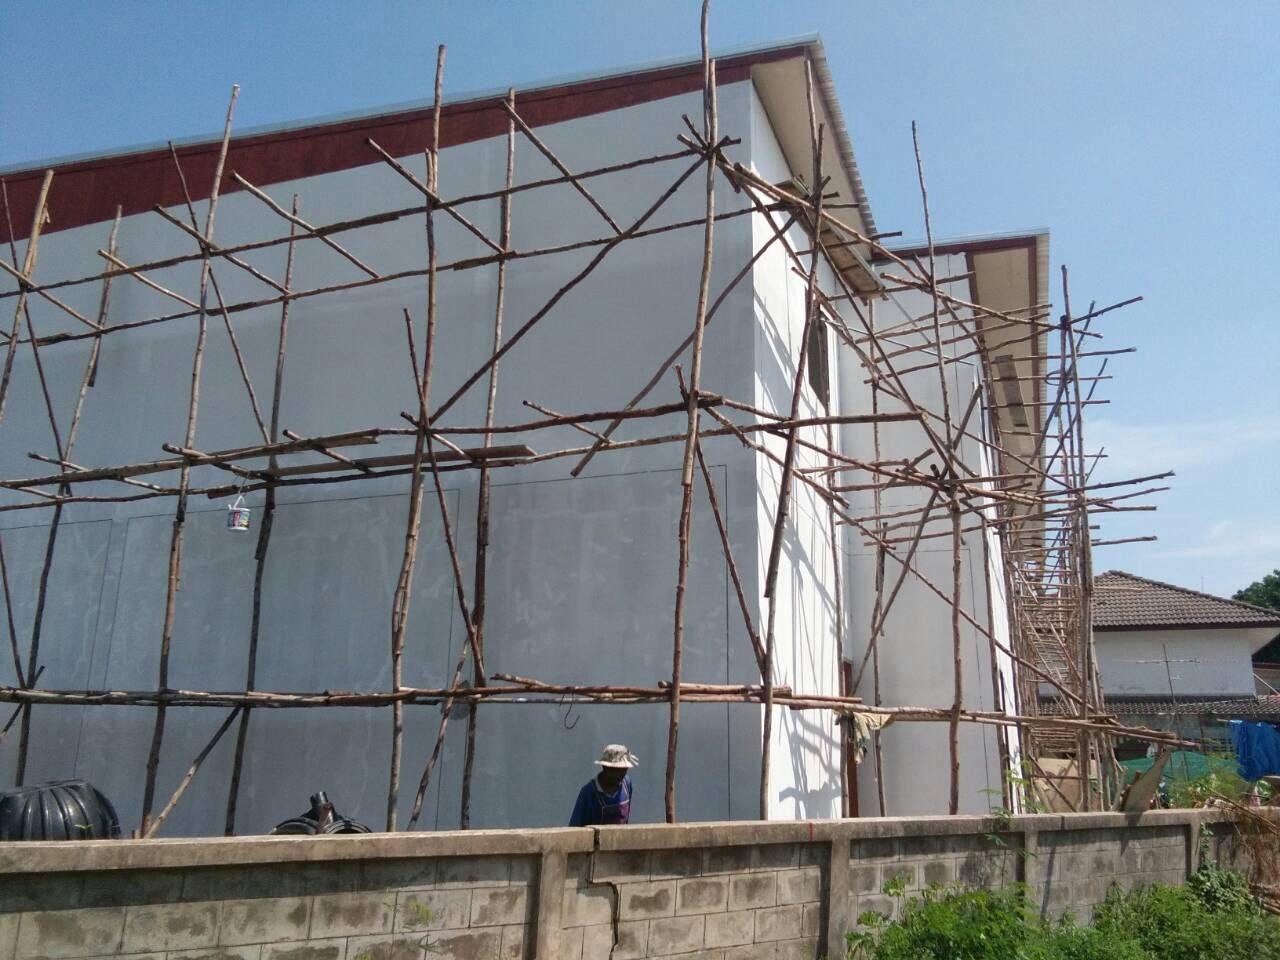 Khon Kaen Housebuilder (8) Khon Kaen construction khon kaen building company.jpe